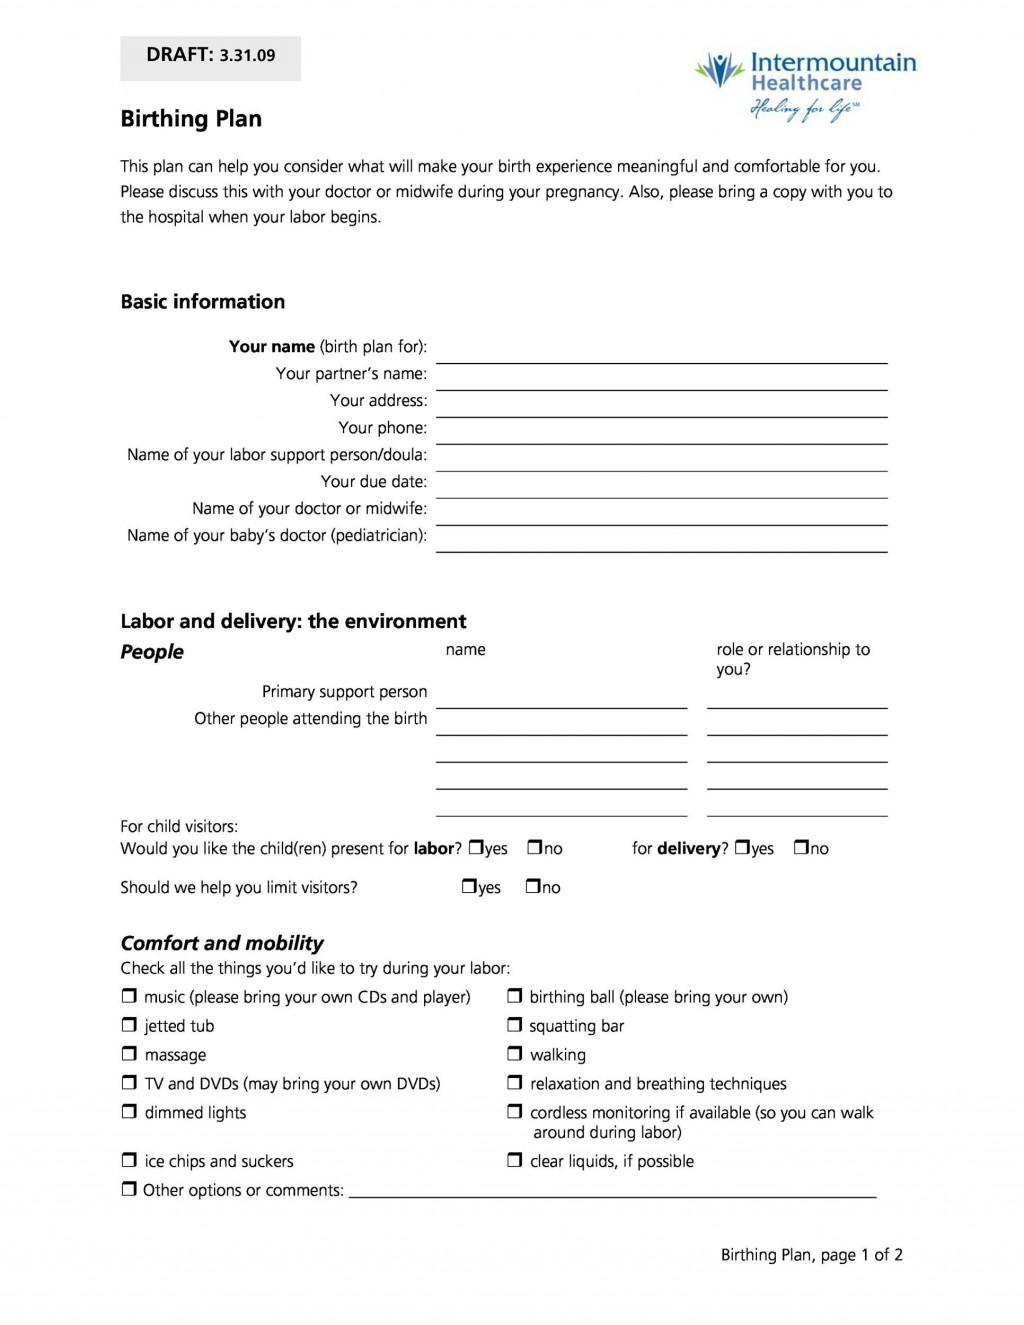 007 Archaicawful Printable Birth Plan Template High Definition  Editable Pdf FreeLarge